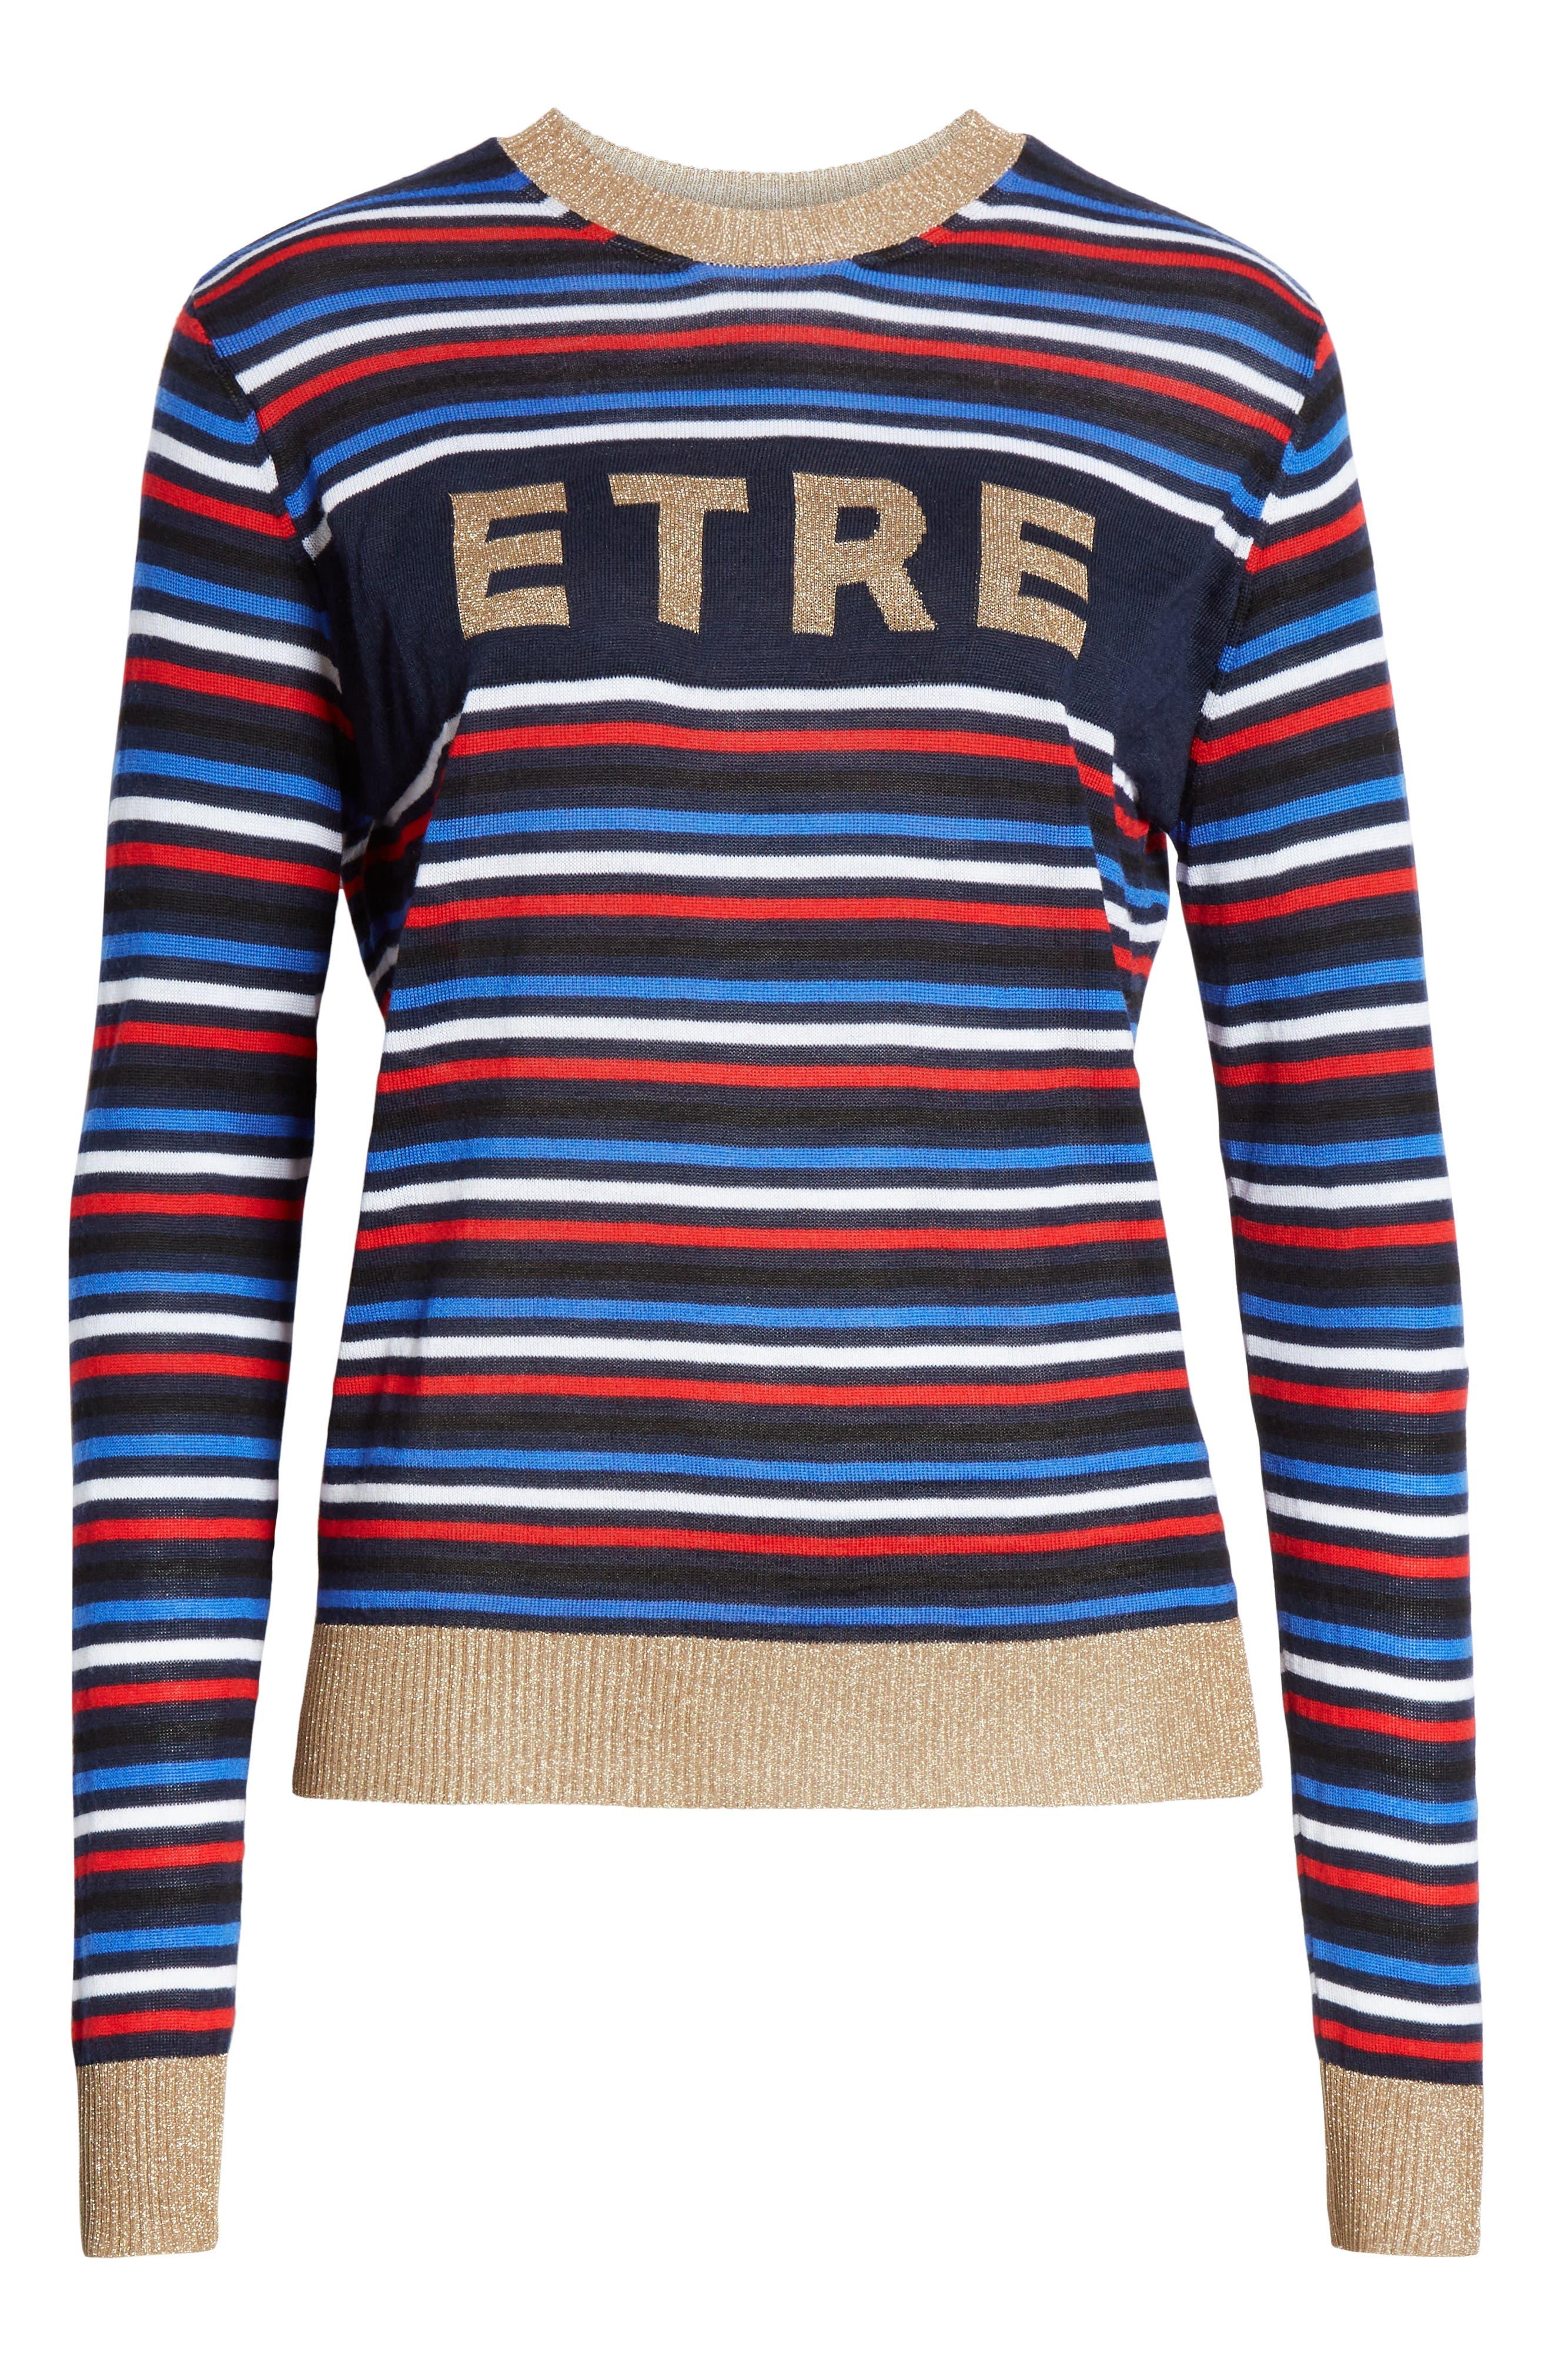 Stripe Knit Boyfriend Sweater,                             Alternate thumbnail 6, color,                             NAVY MULTI STRIPE